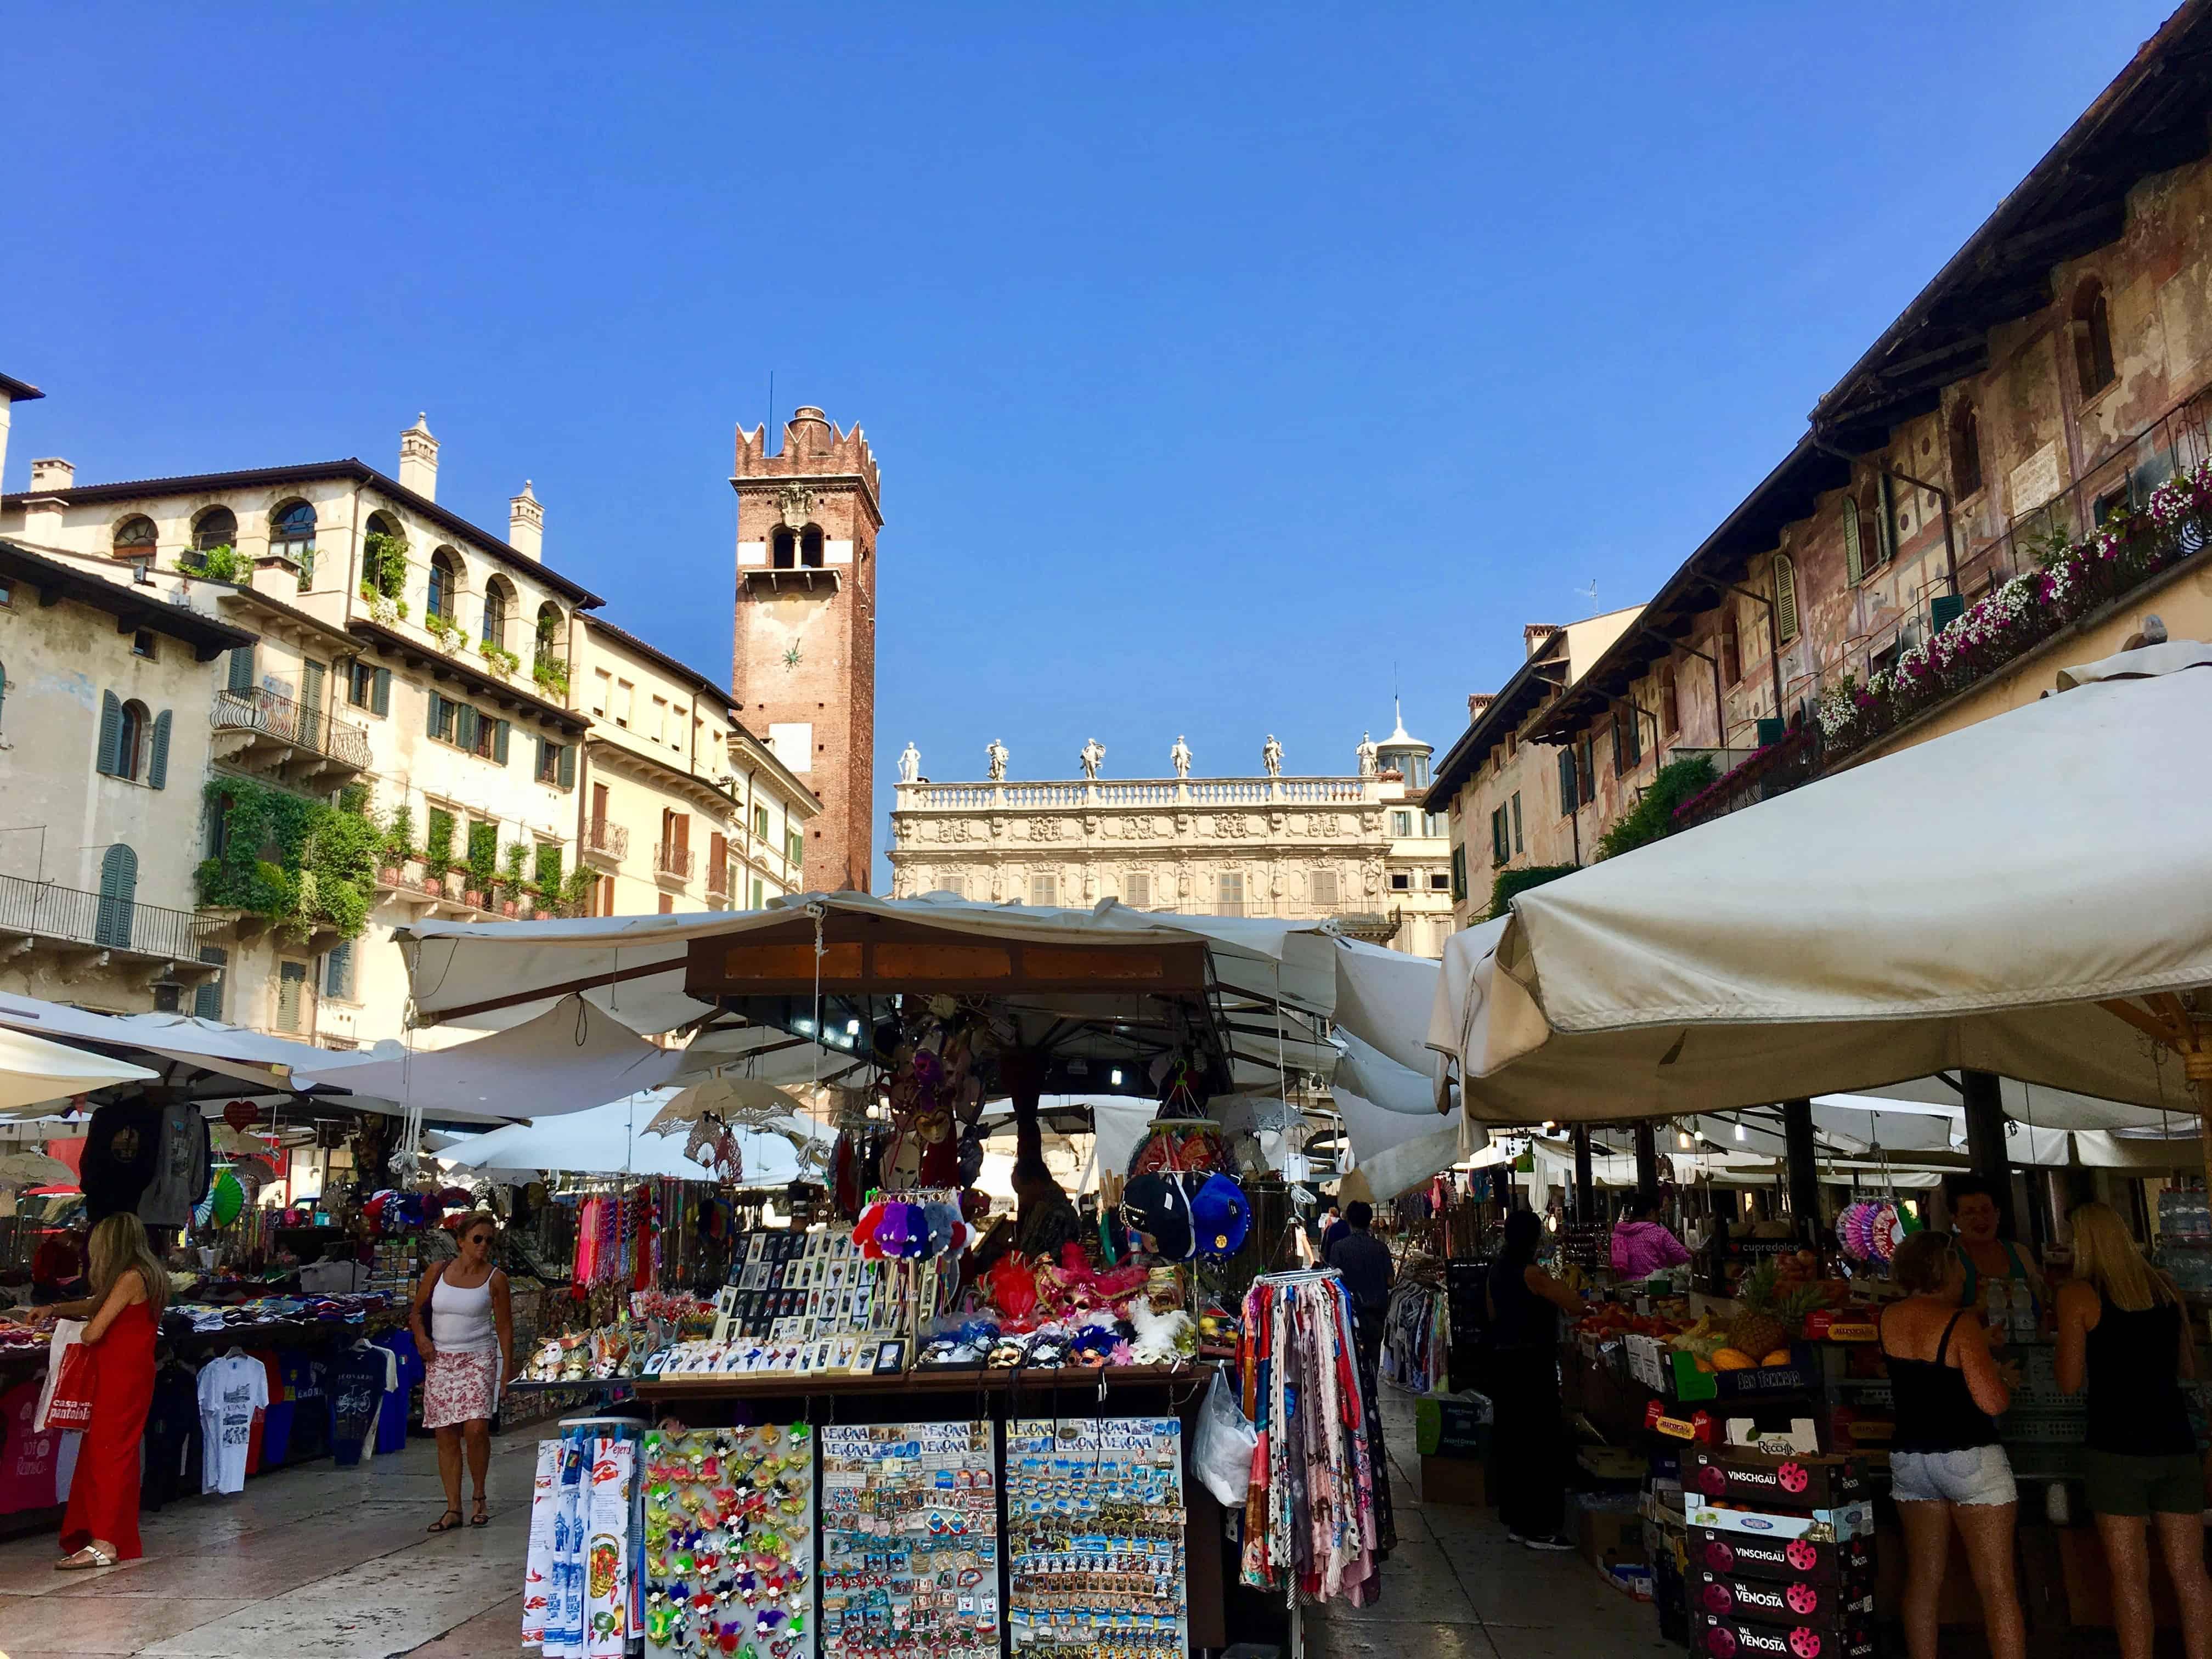 Verona Market at Piazza Erbe